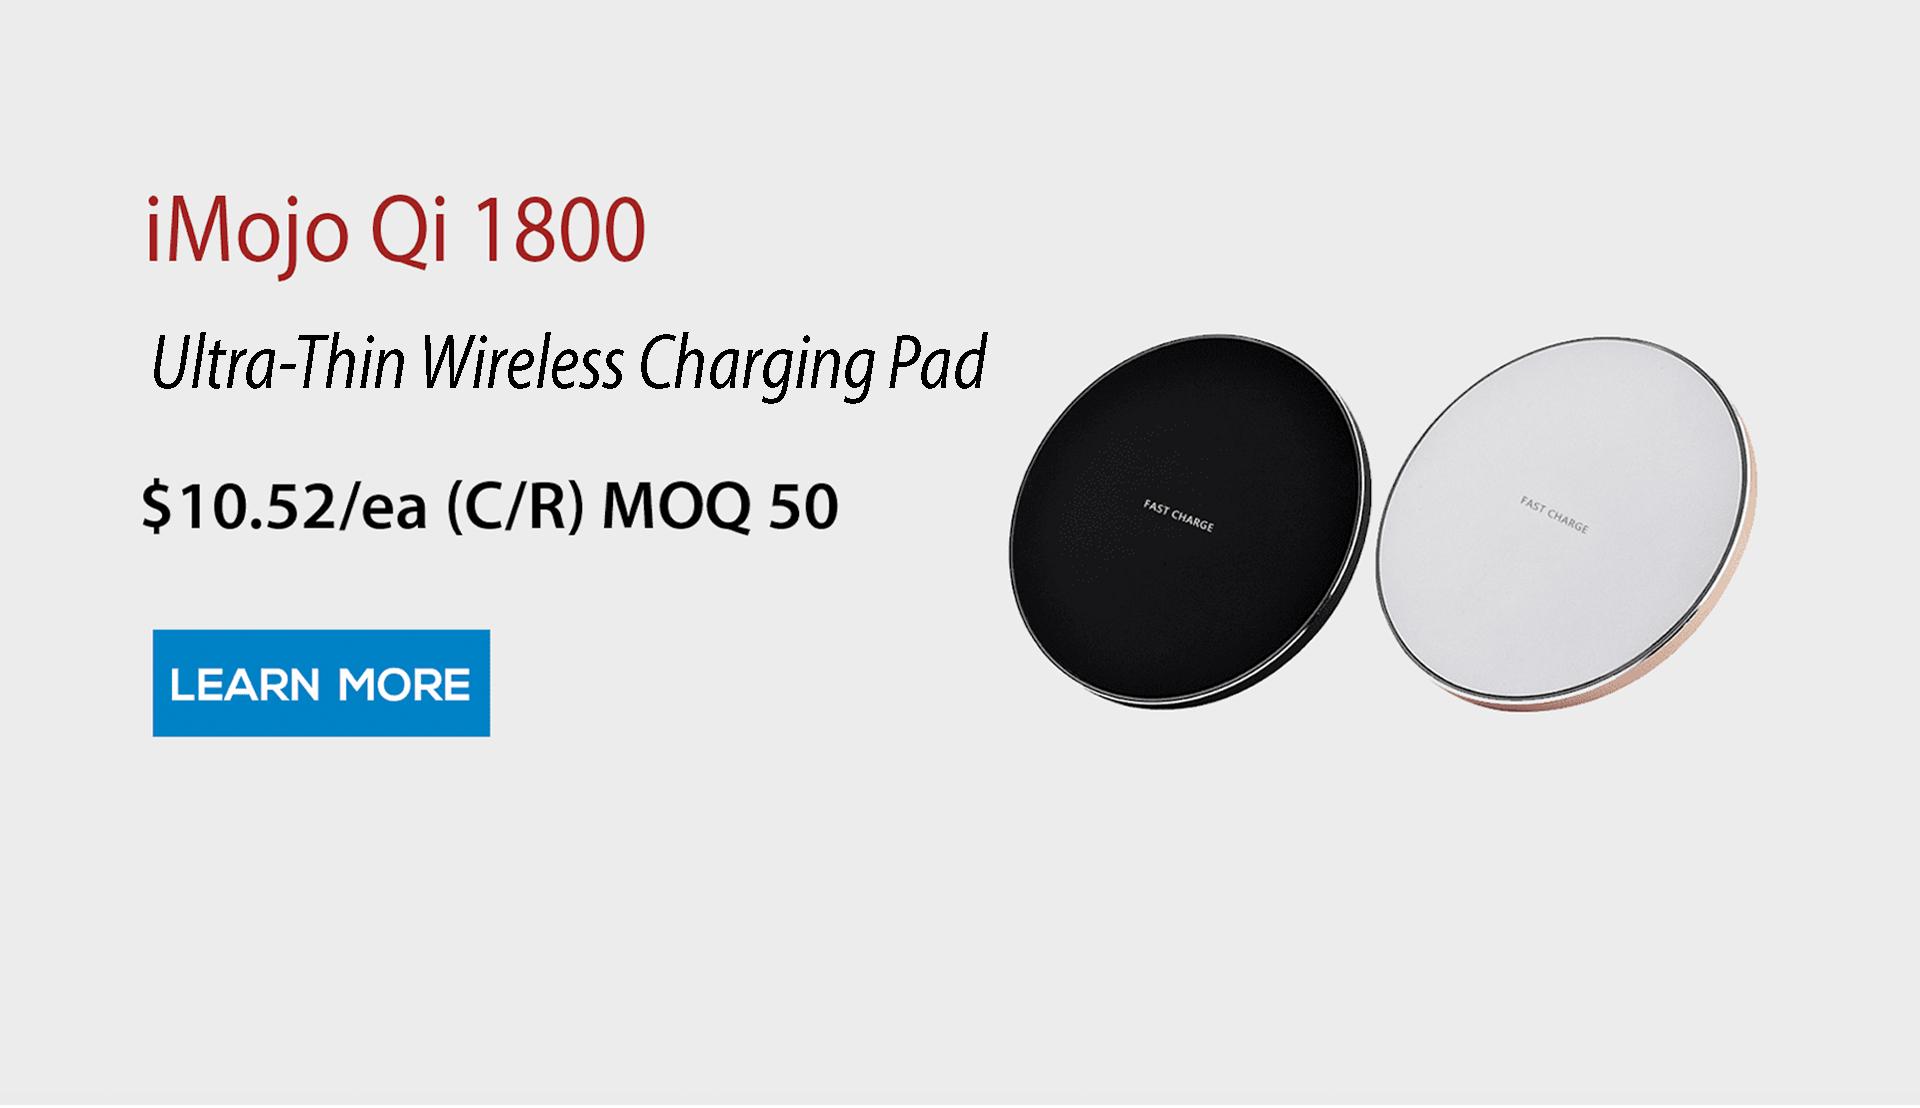 iMojo Qi 1800 Fast Wireless Charging Pad